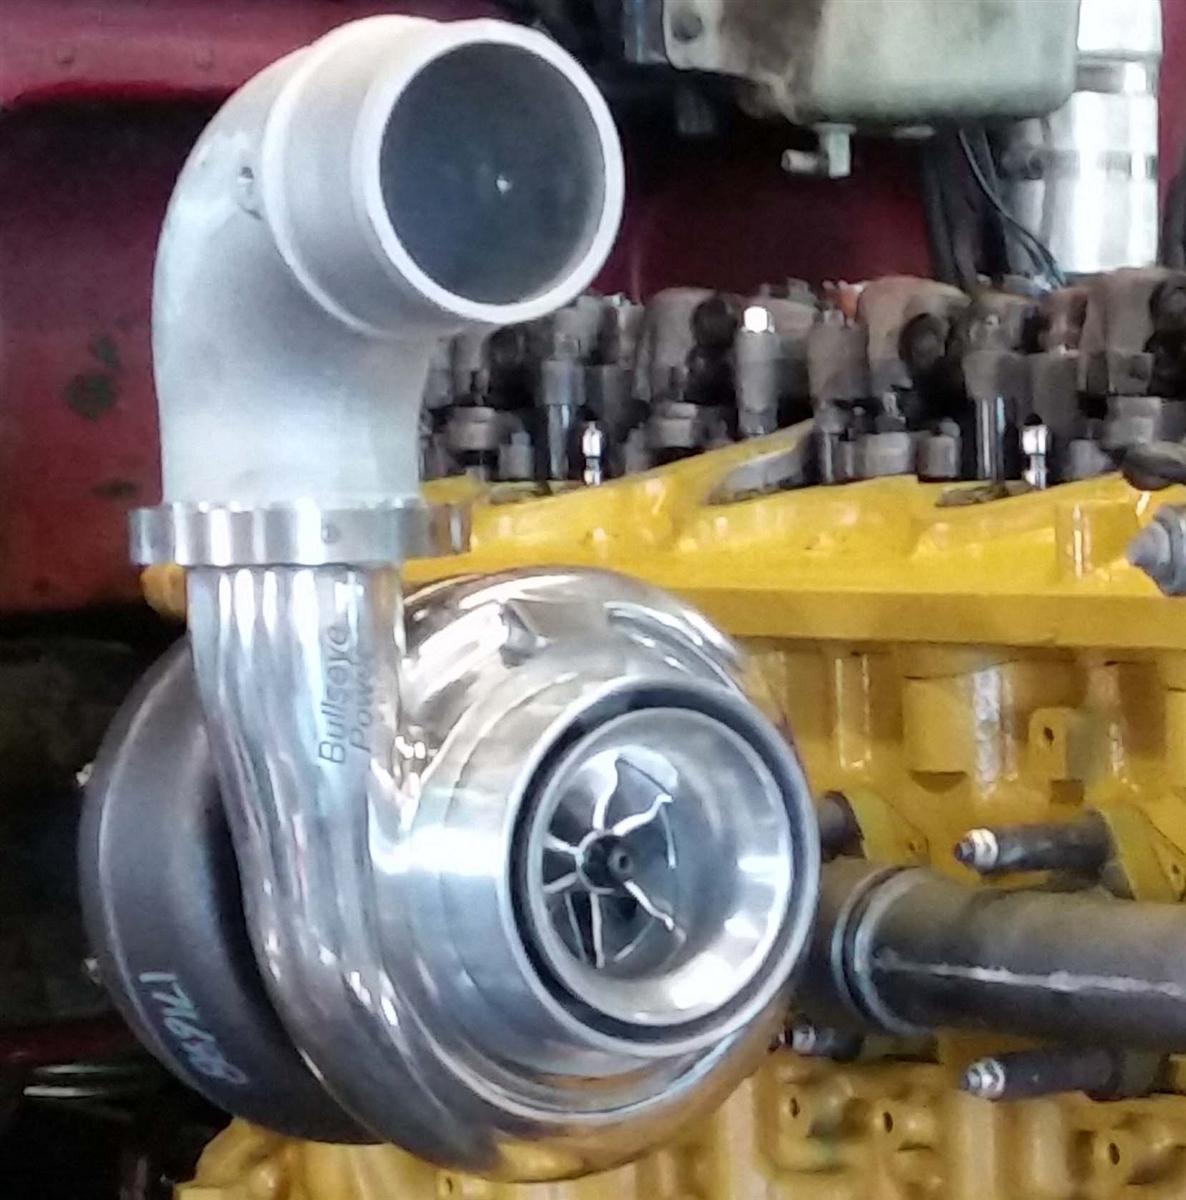 Bullseye Power TCT Performance Turbo